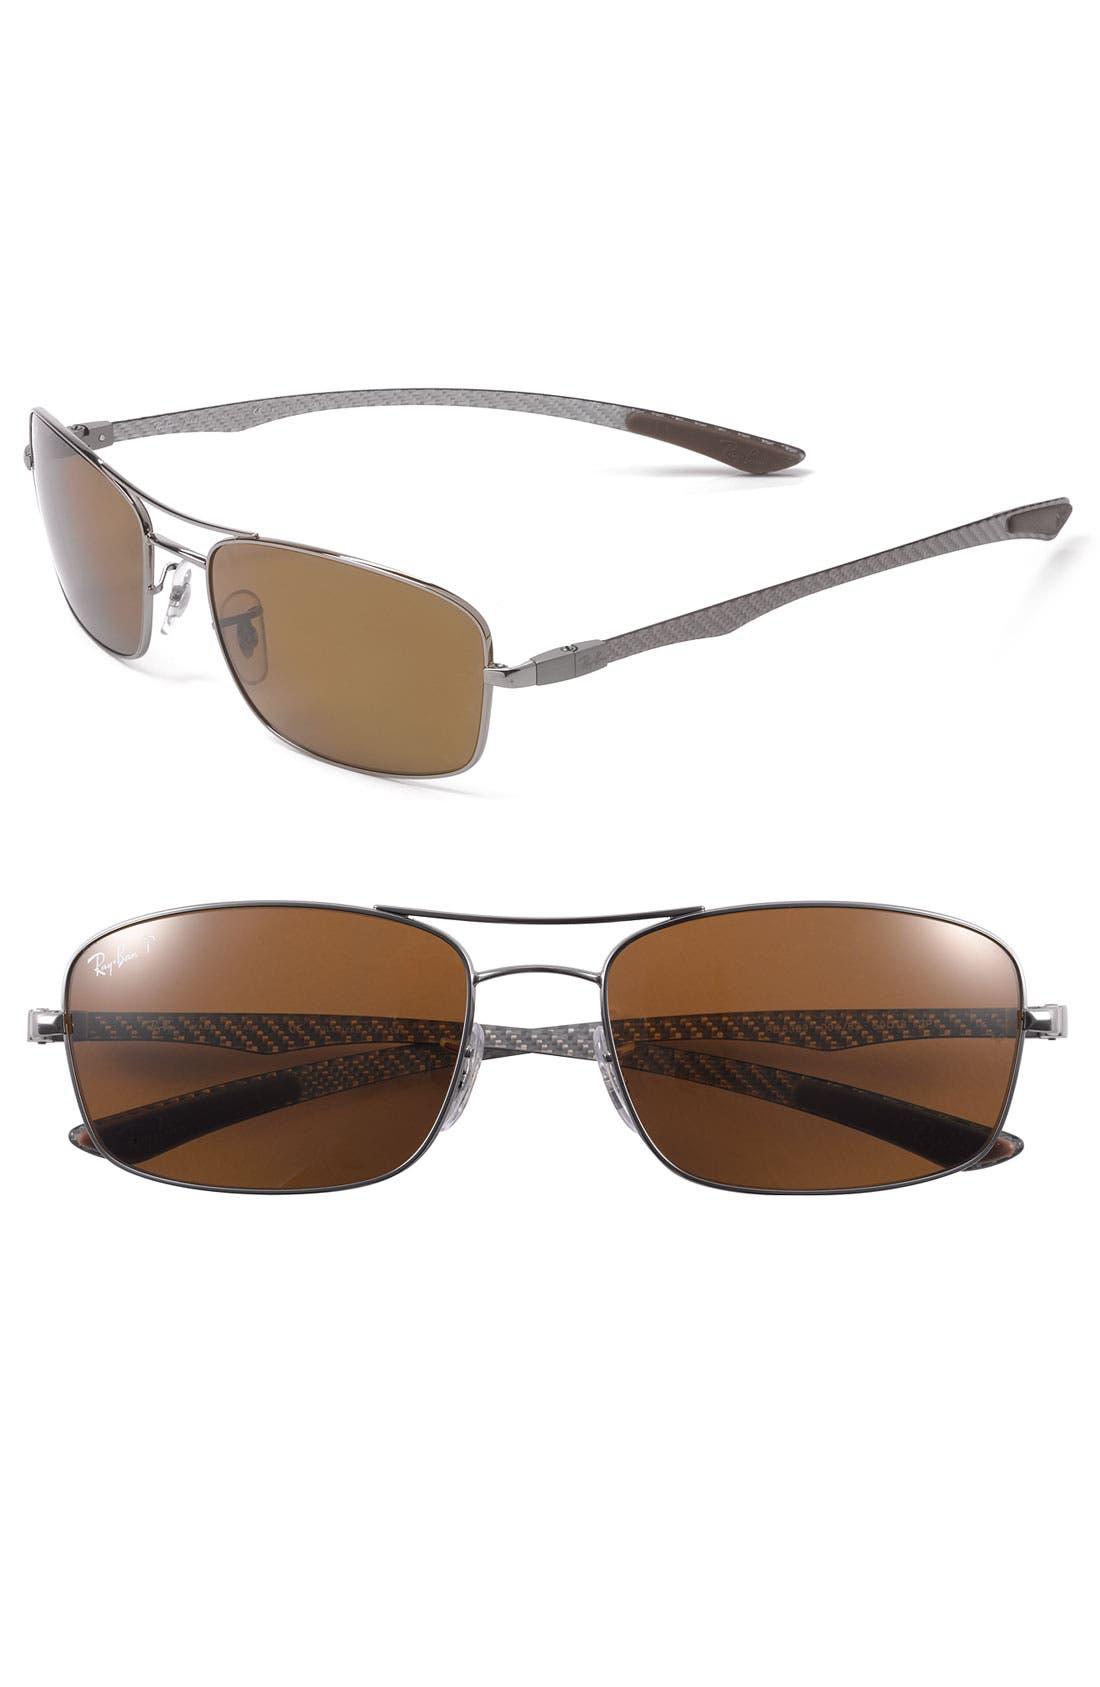 Main Image - Ray-Ban 59mm Polarized Double Bridge Sunglasses